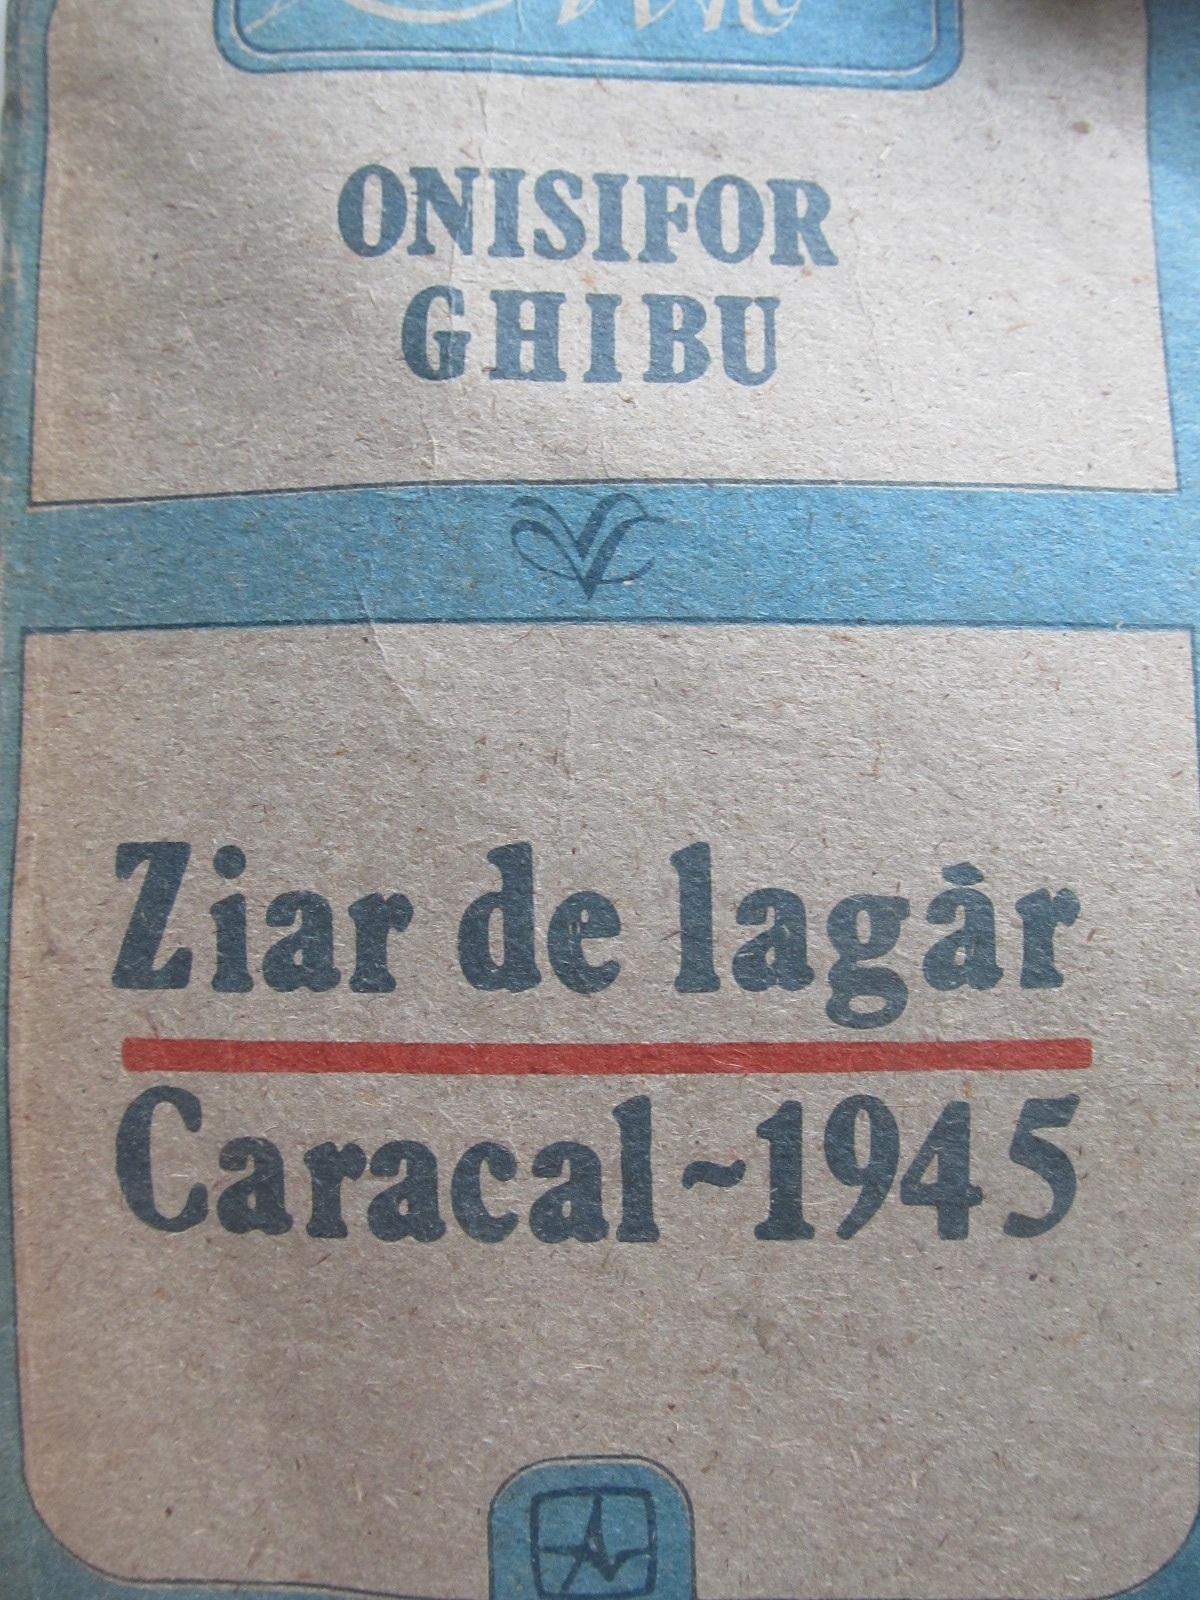 Ziar de lagar Caracal 1945 - Onisifor Ghibu | Detalii carte